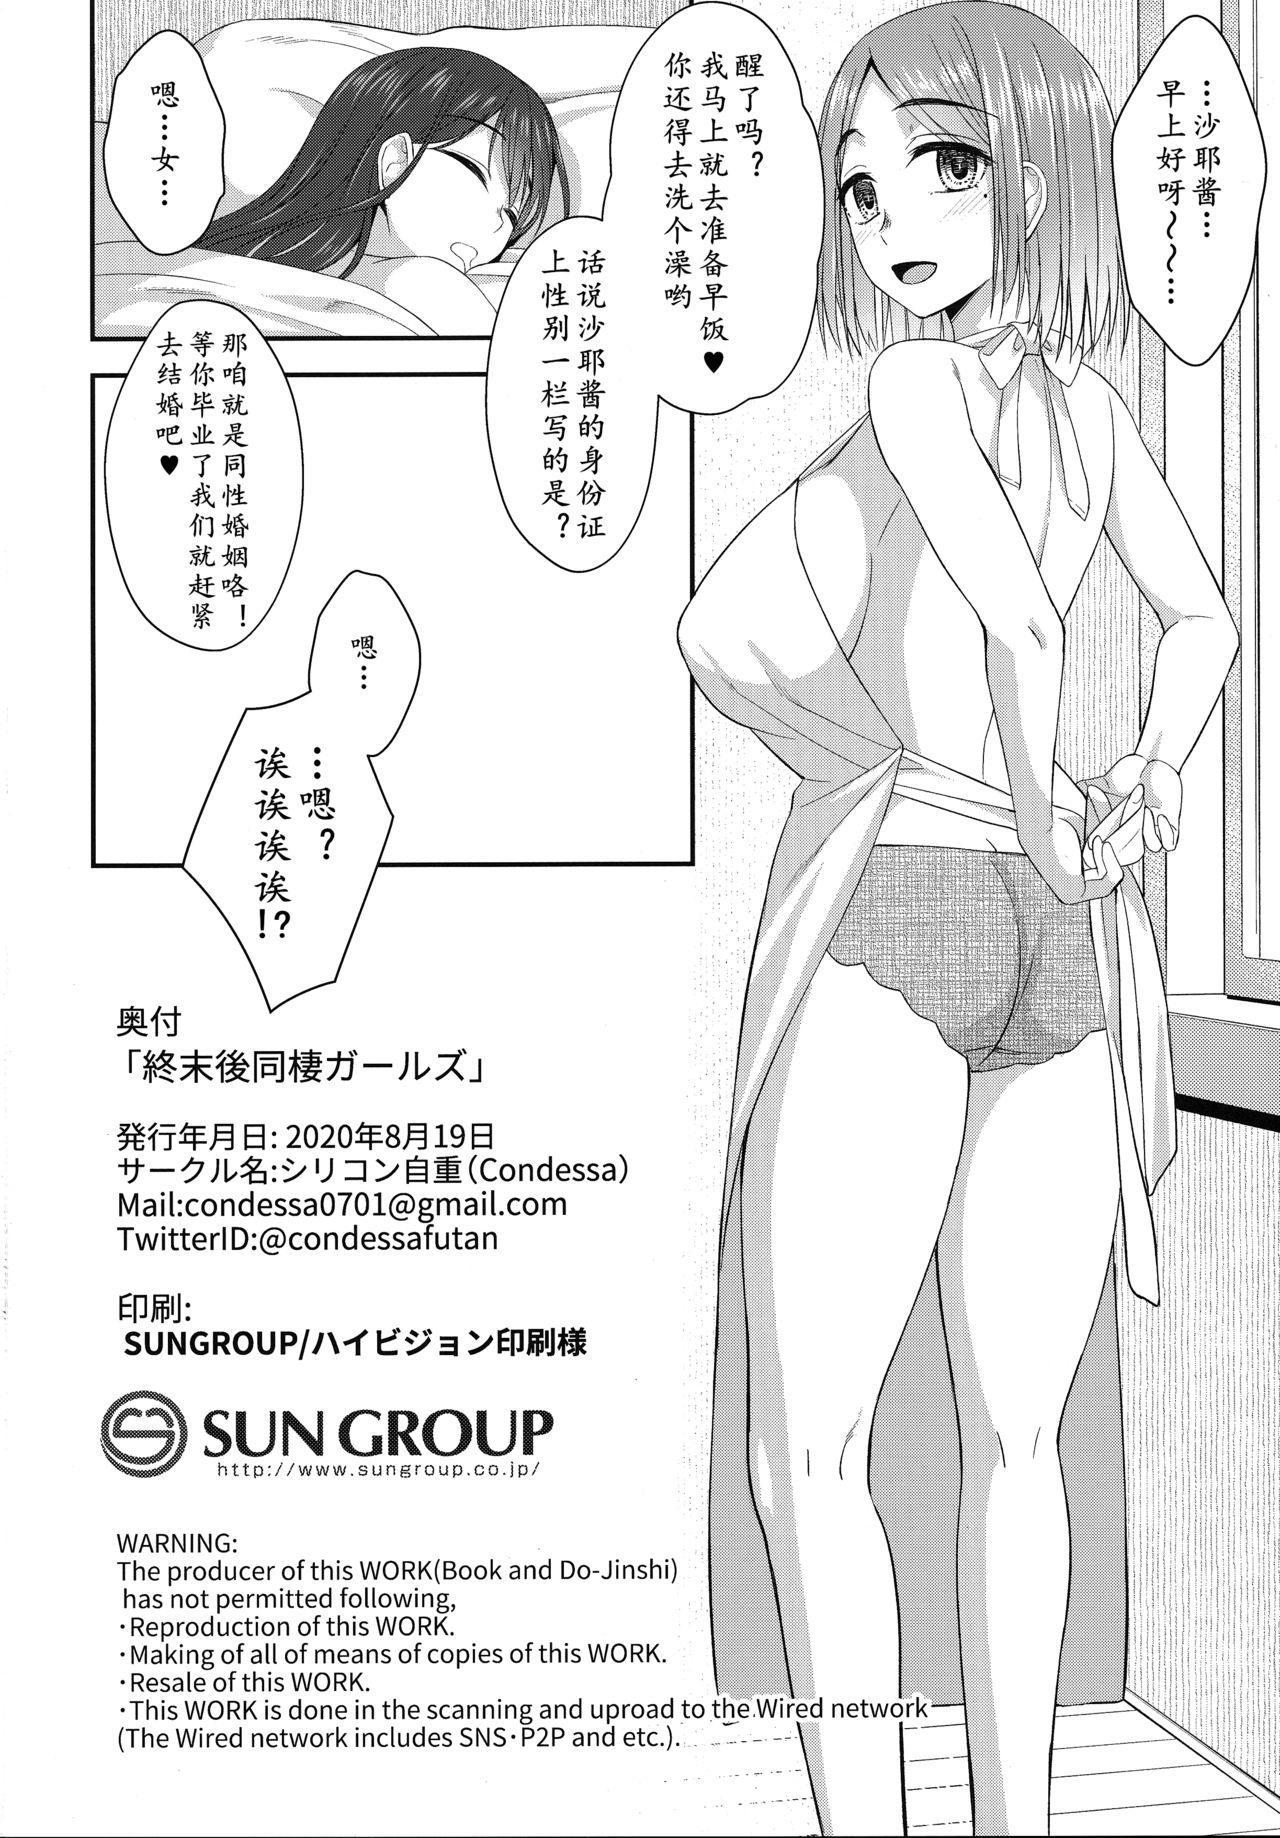 Shuumatsugo Dousei Girls | 终末前的破处少女 2 25